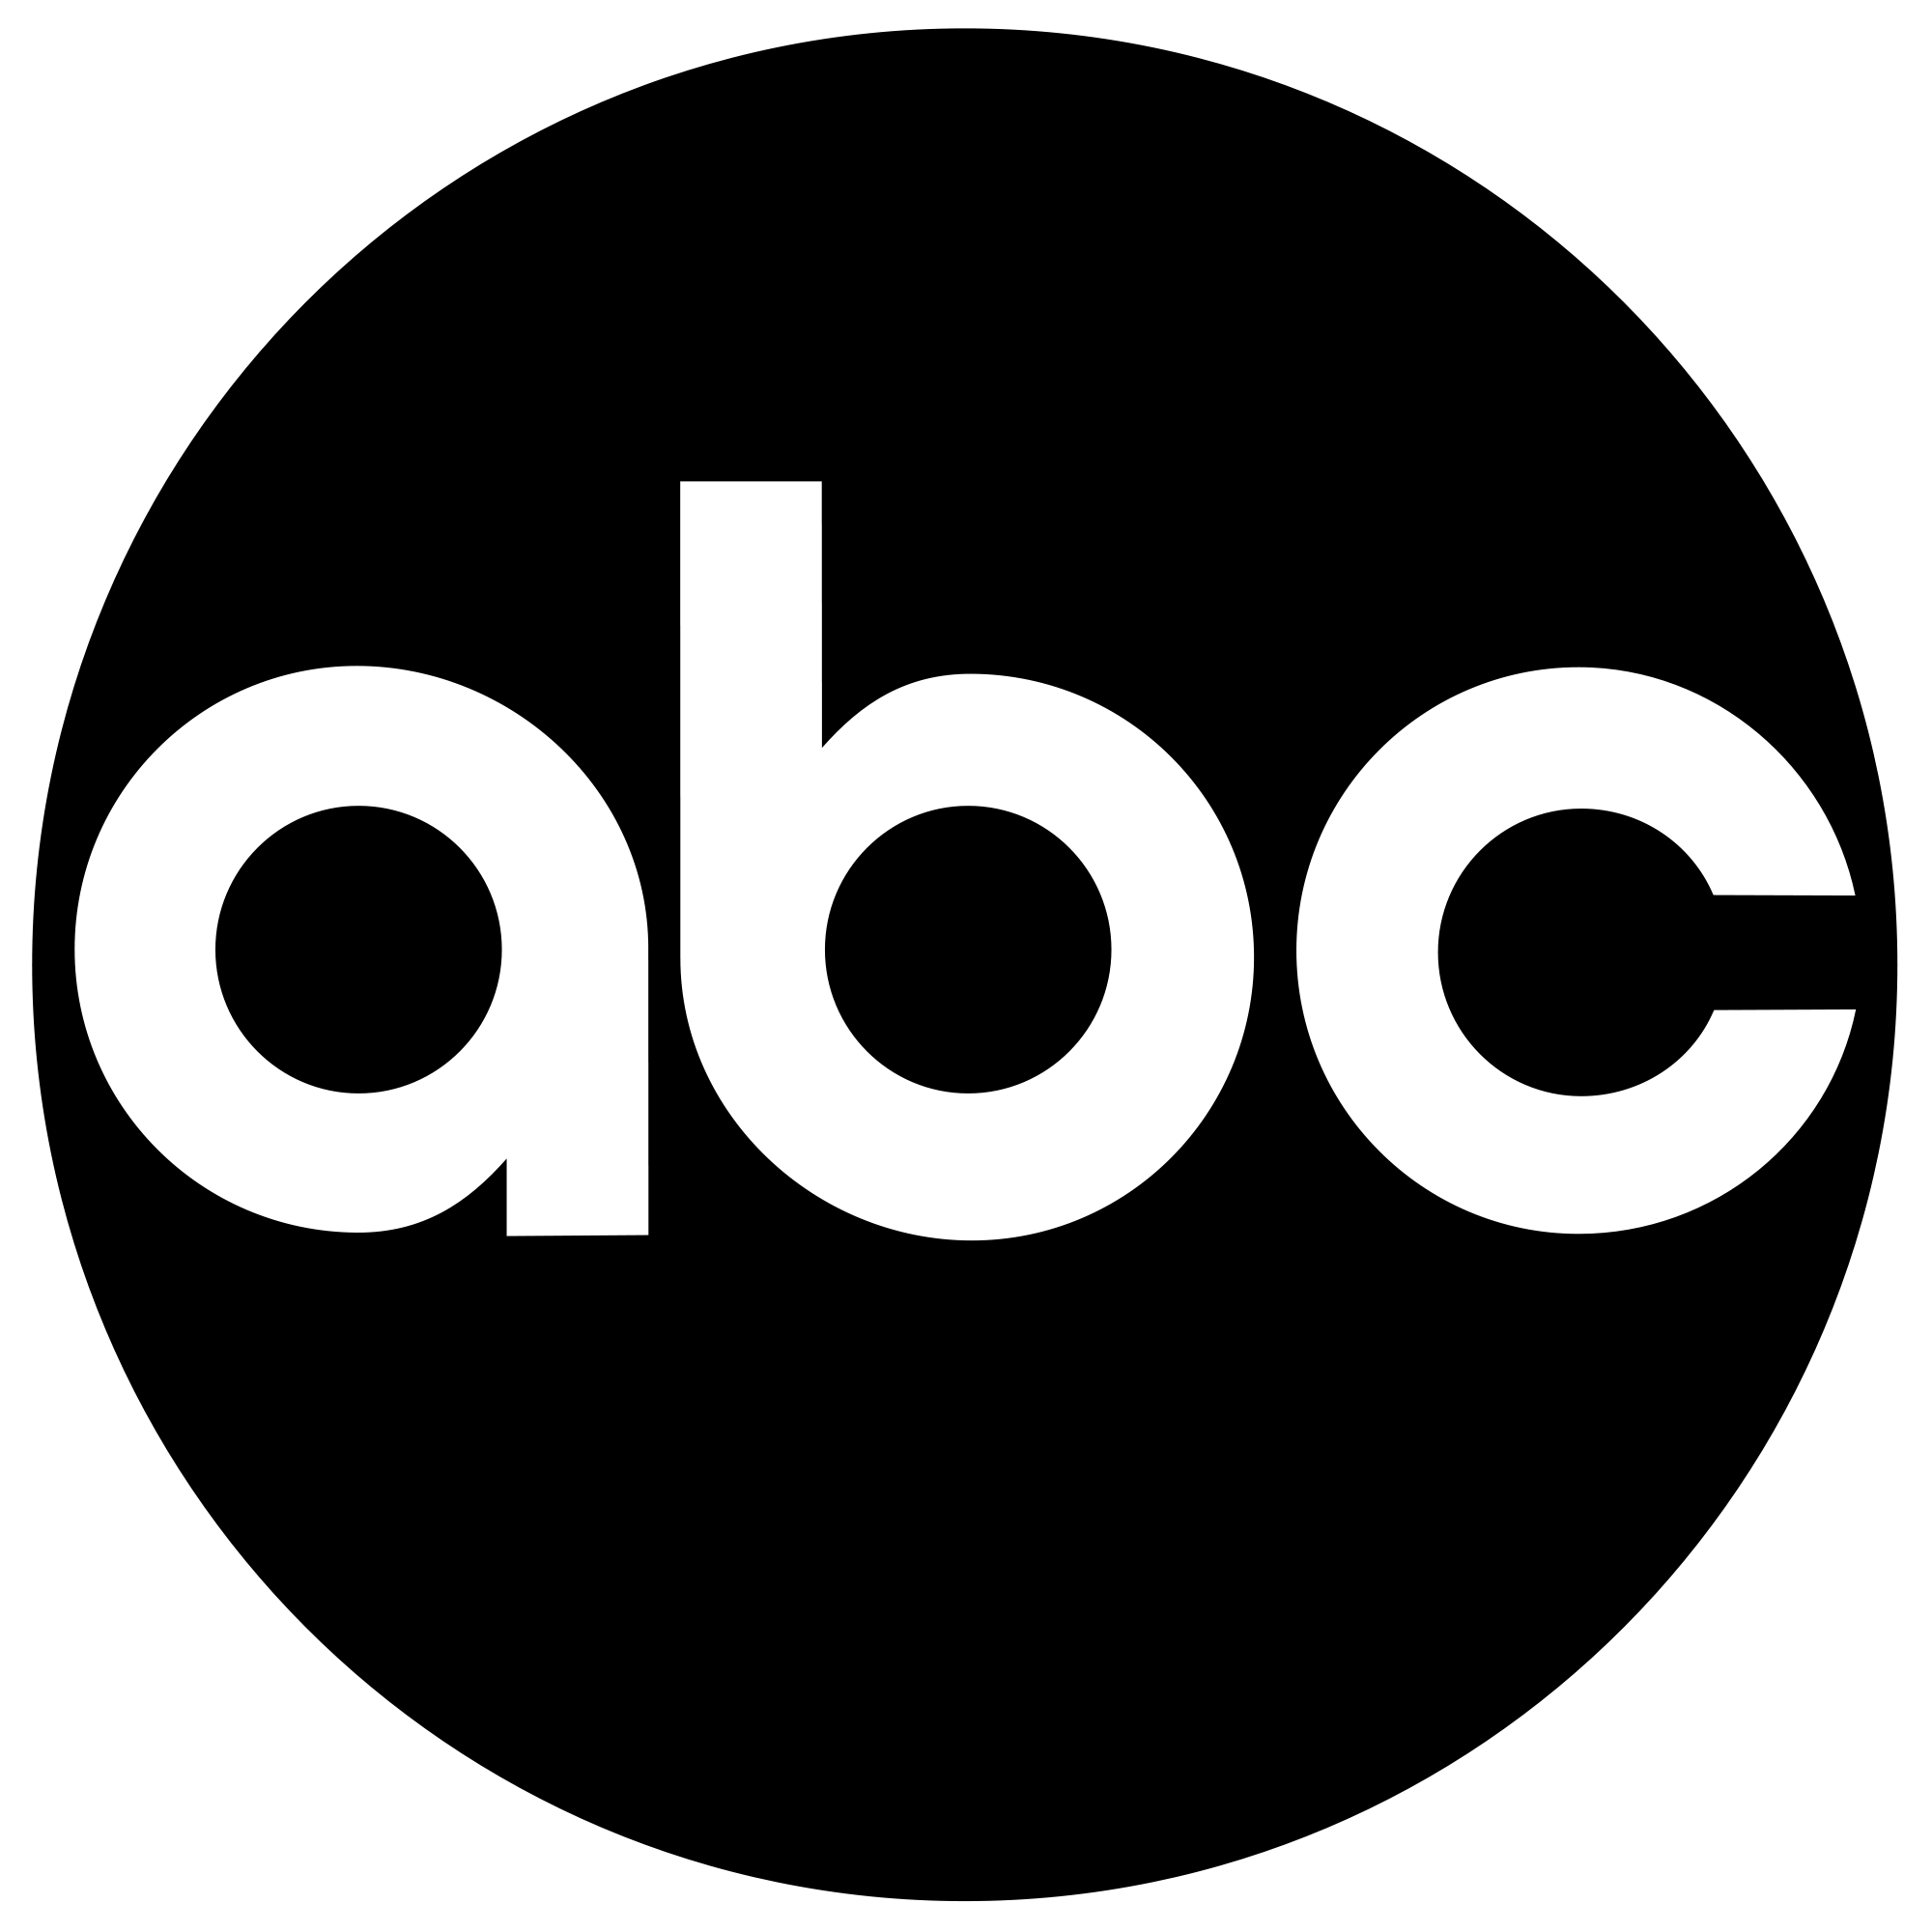 abc logo black